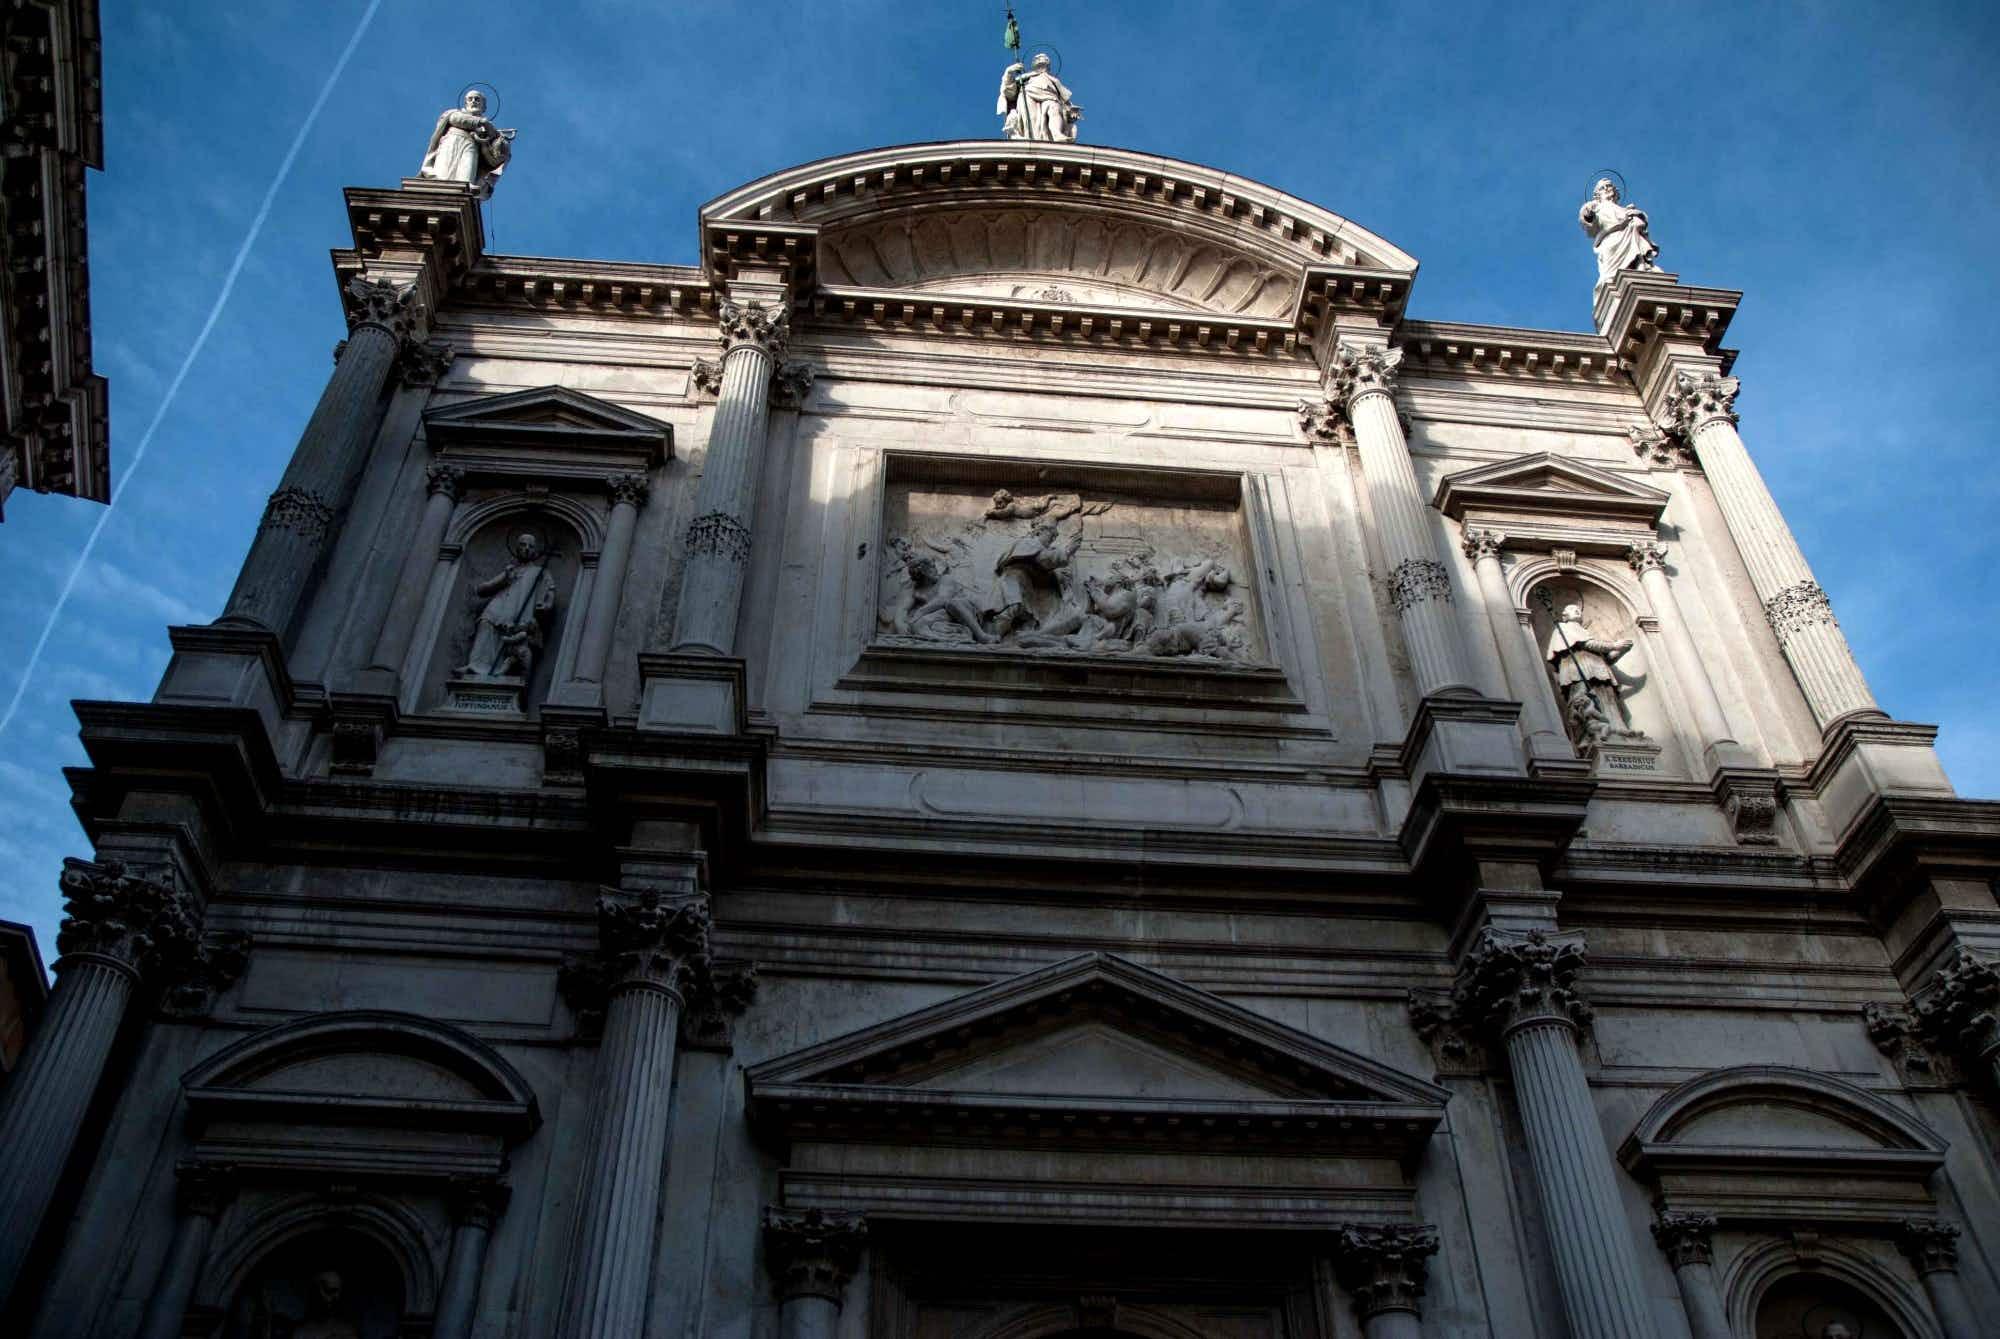 Venice set to celebrate Tintoretto's 500th birthday